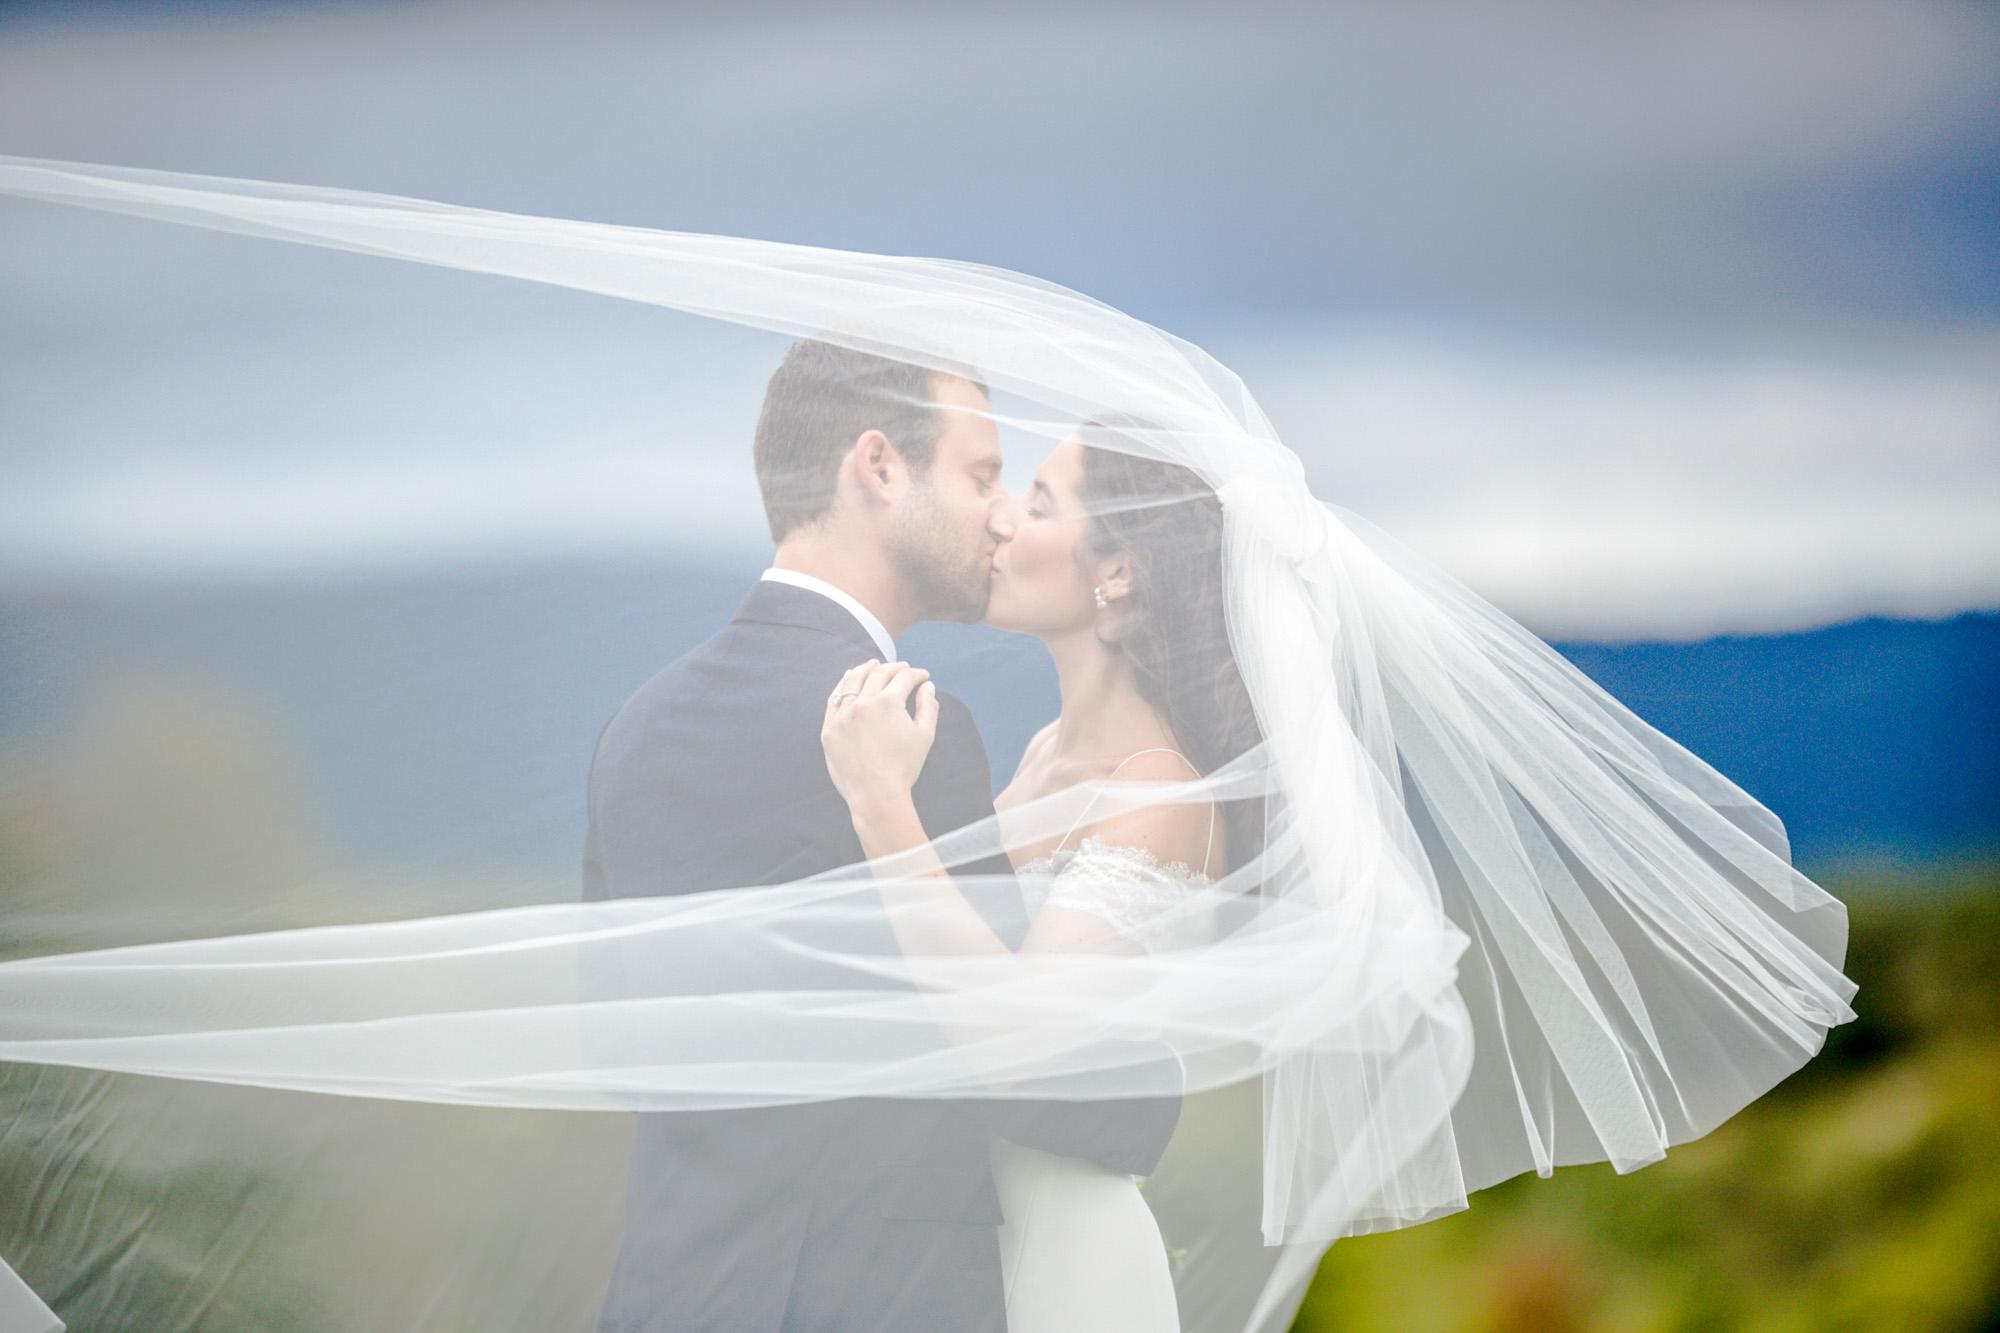 scranton_wedding_photographer_lettieri_pa (16 of 34).jpg